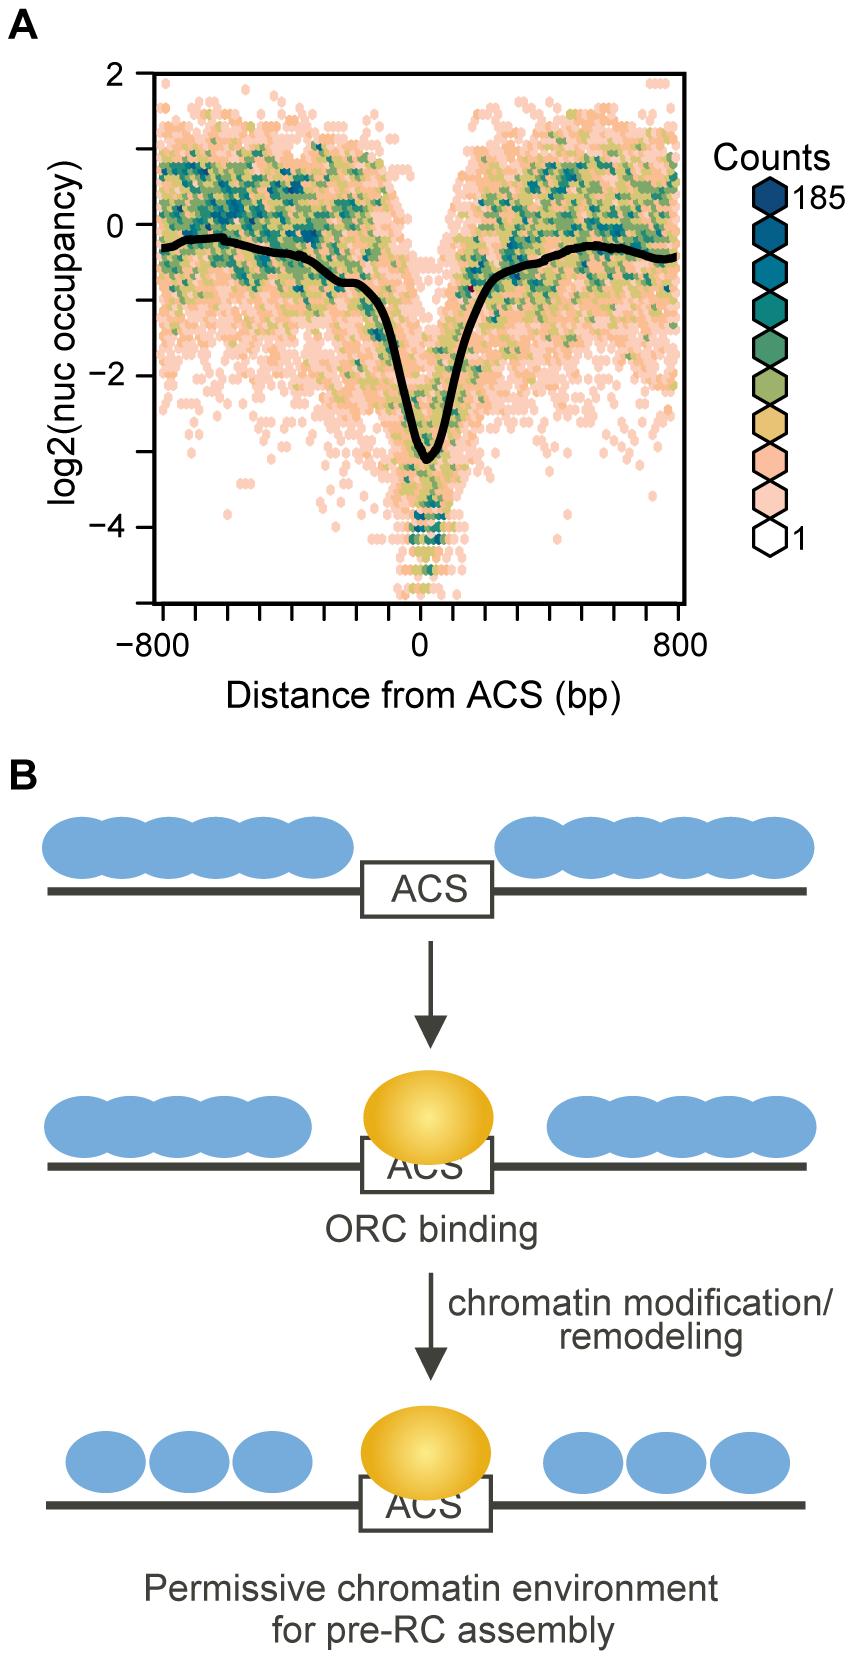 Nucleosome occupancy at replication origins in chromatin assembled <i>in vitro</i>.